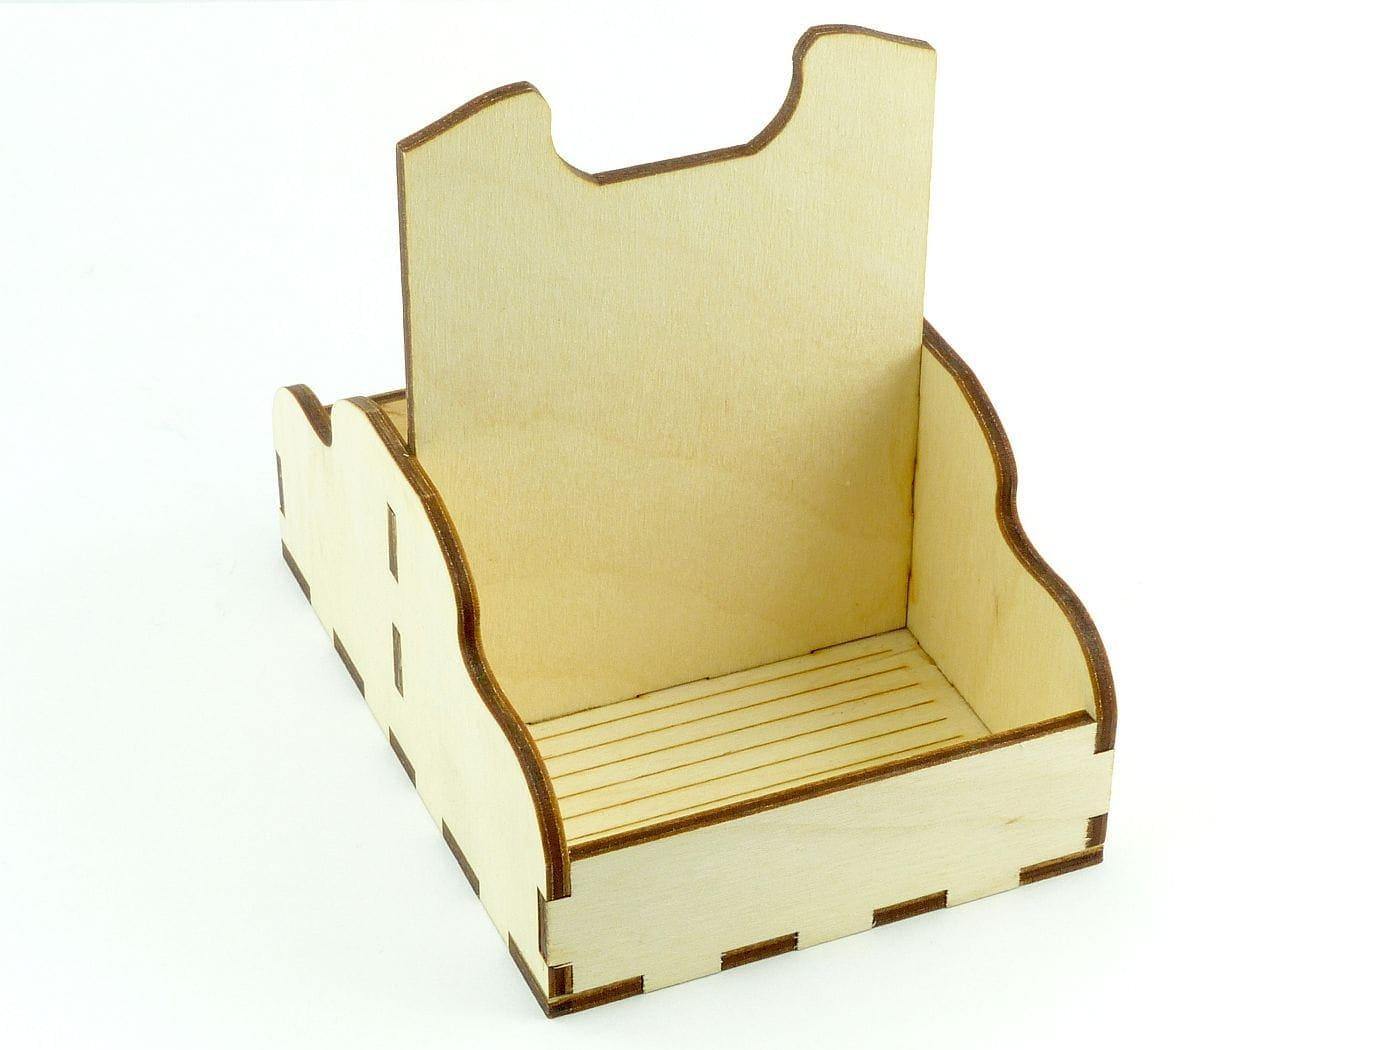 assembled card tray, standard CCG, 68 x 46 mm - 1